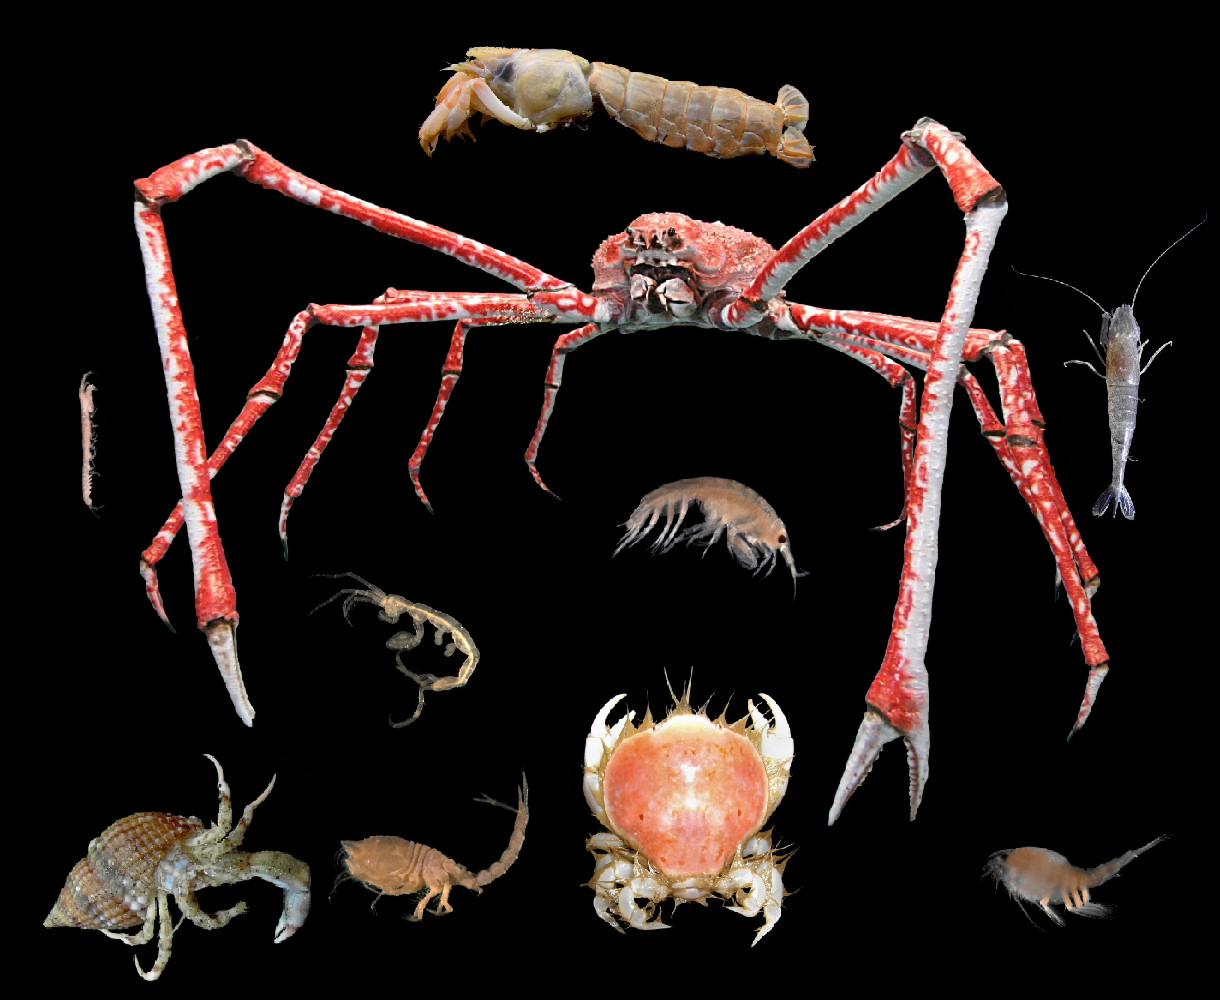 Depiction of Crustacea